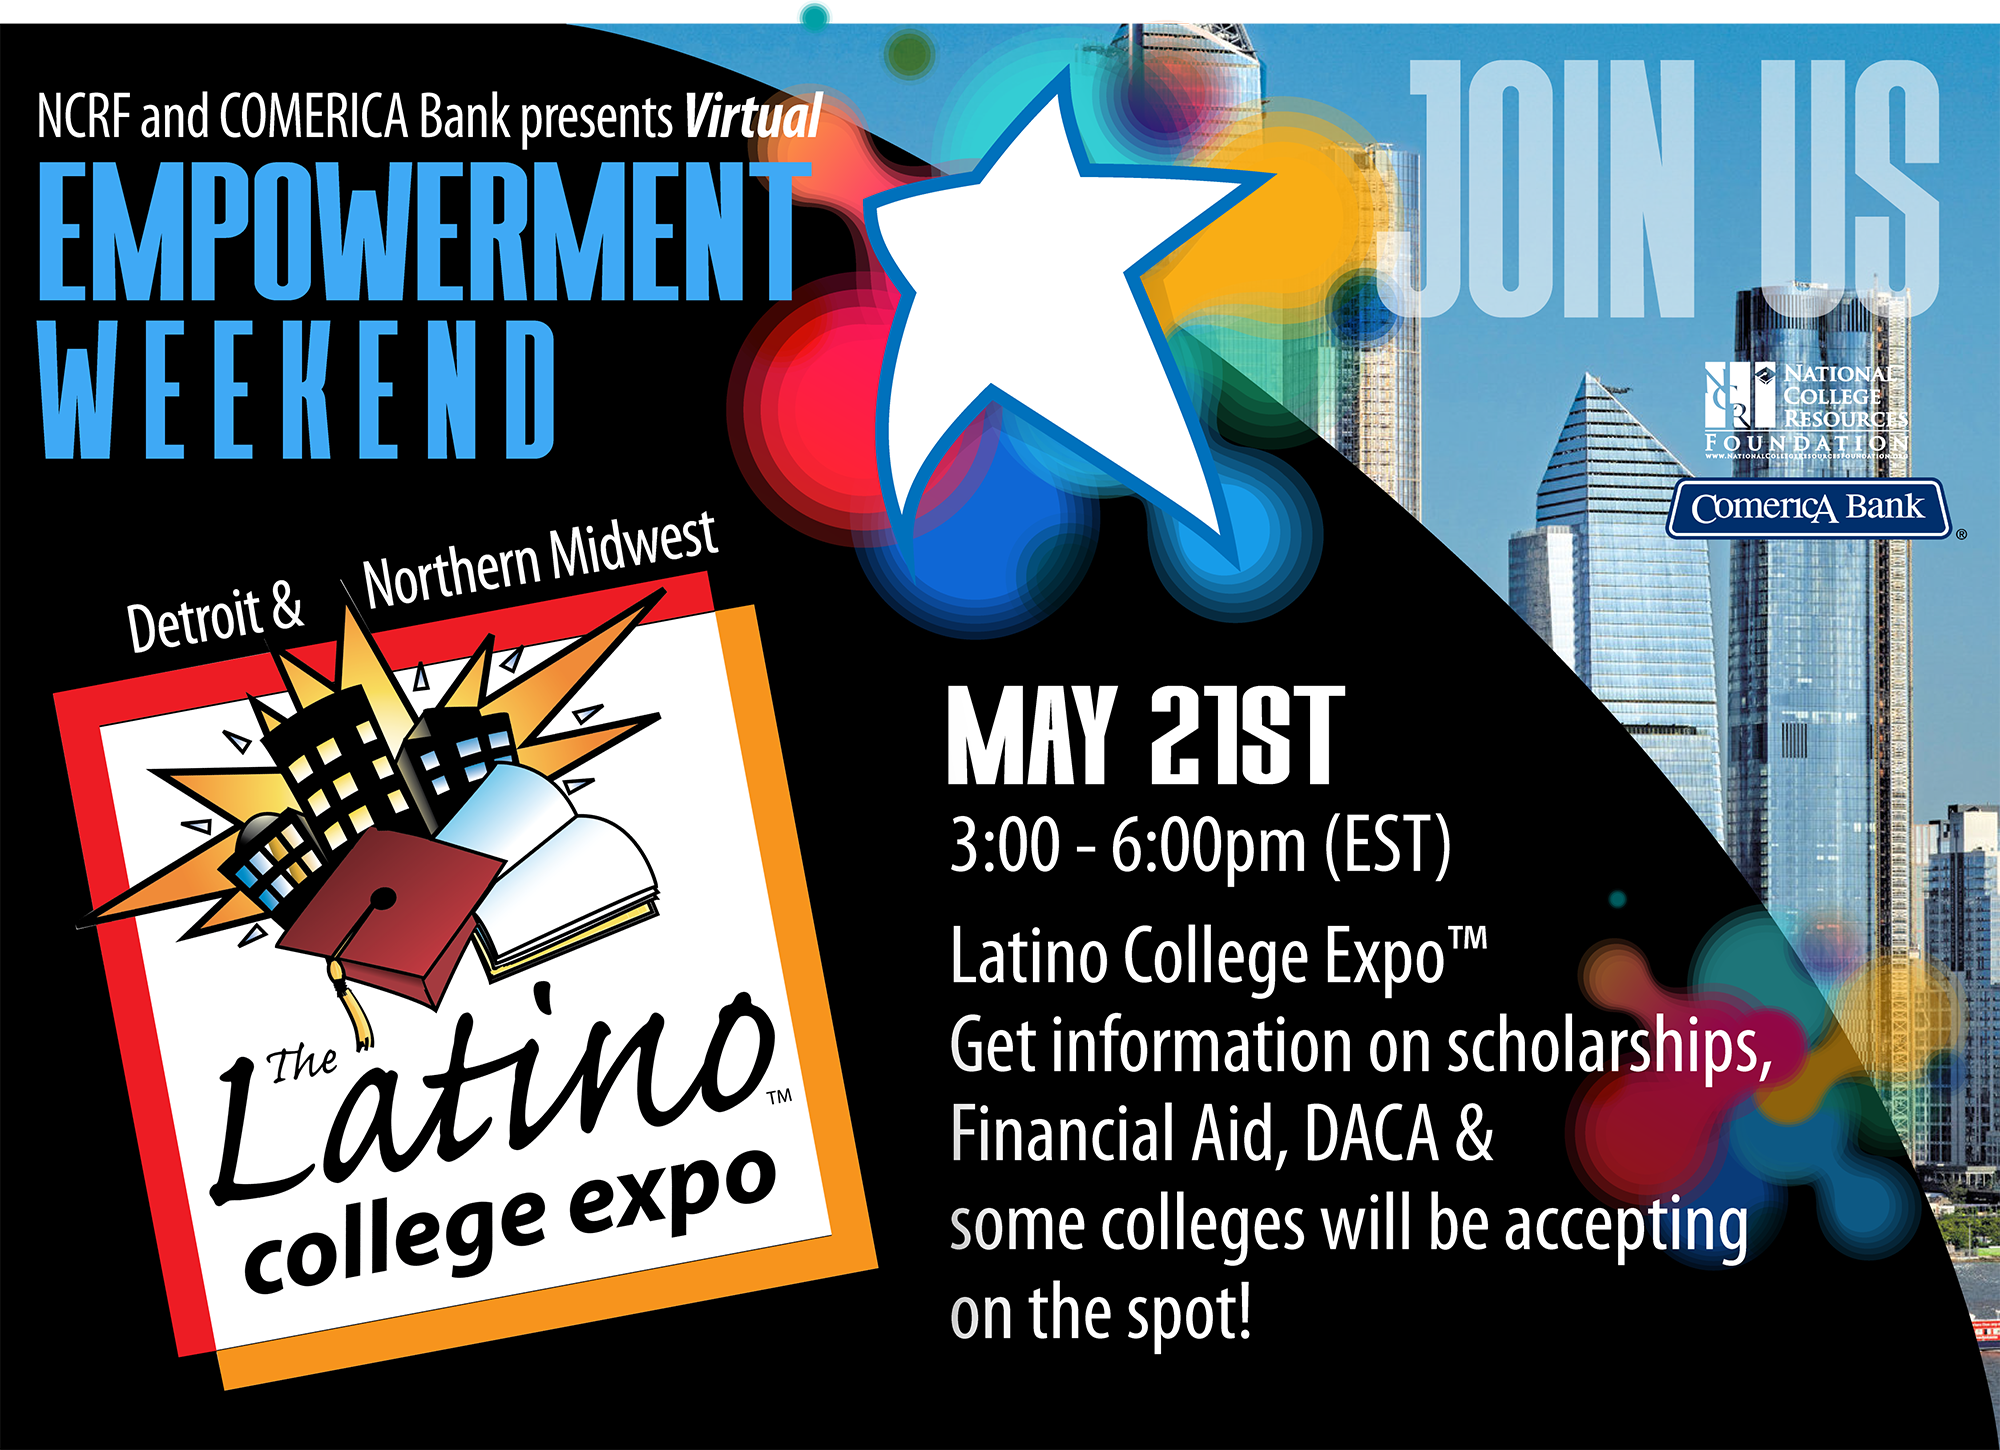 Empowerment Weekend May 21